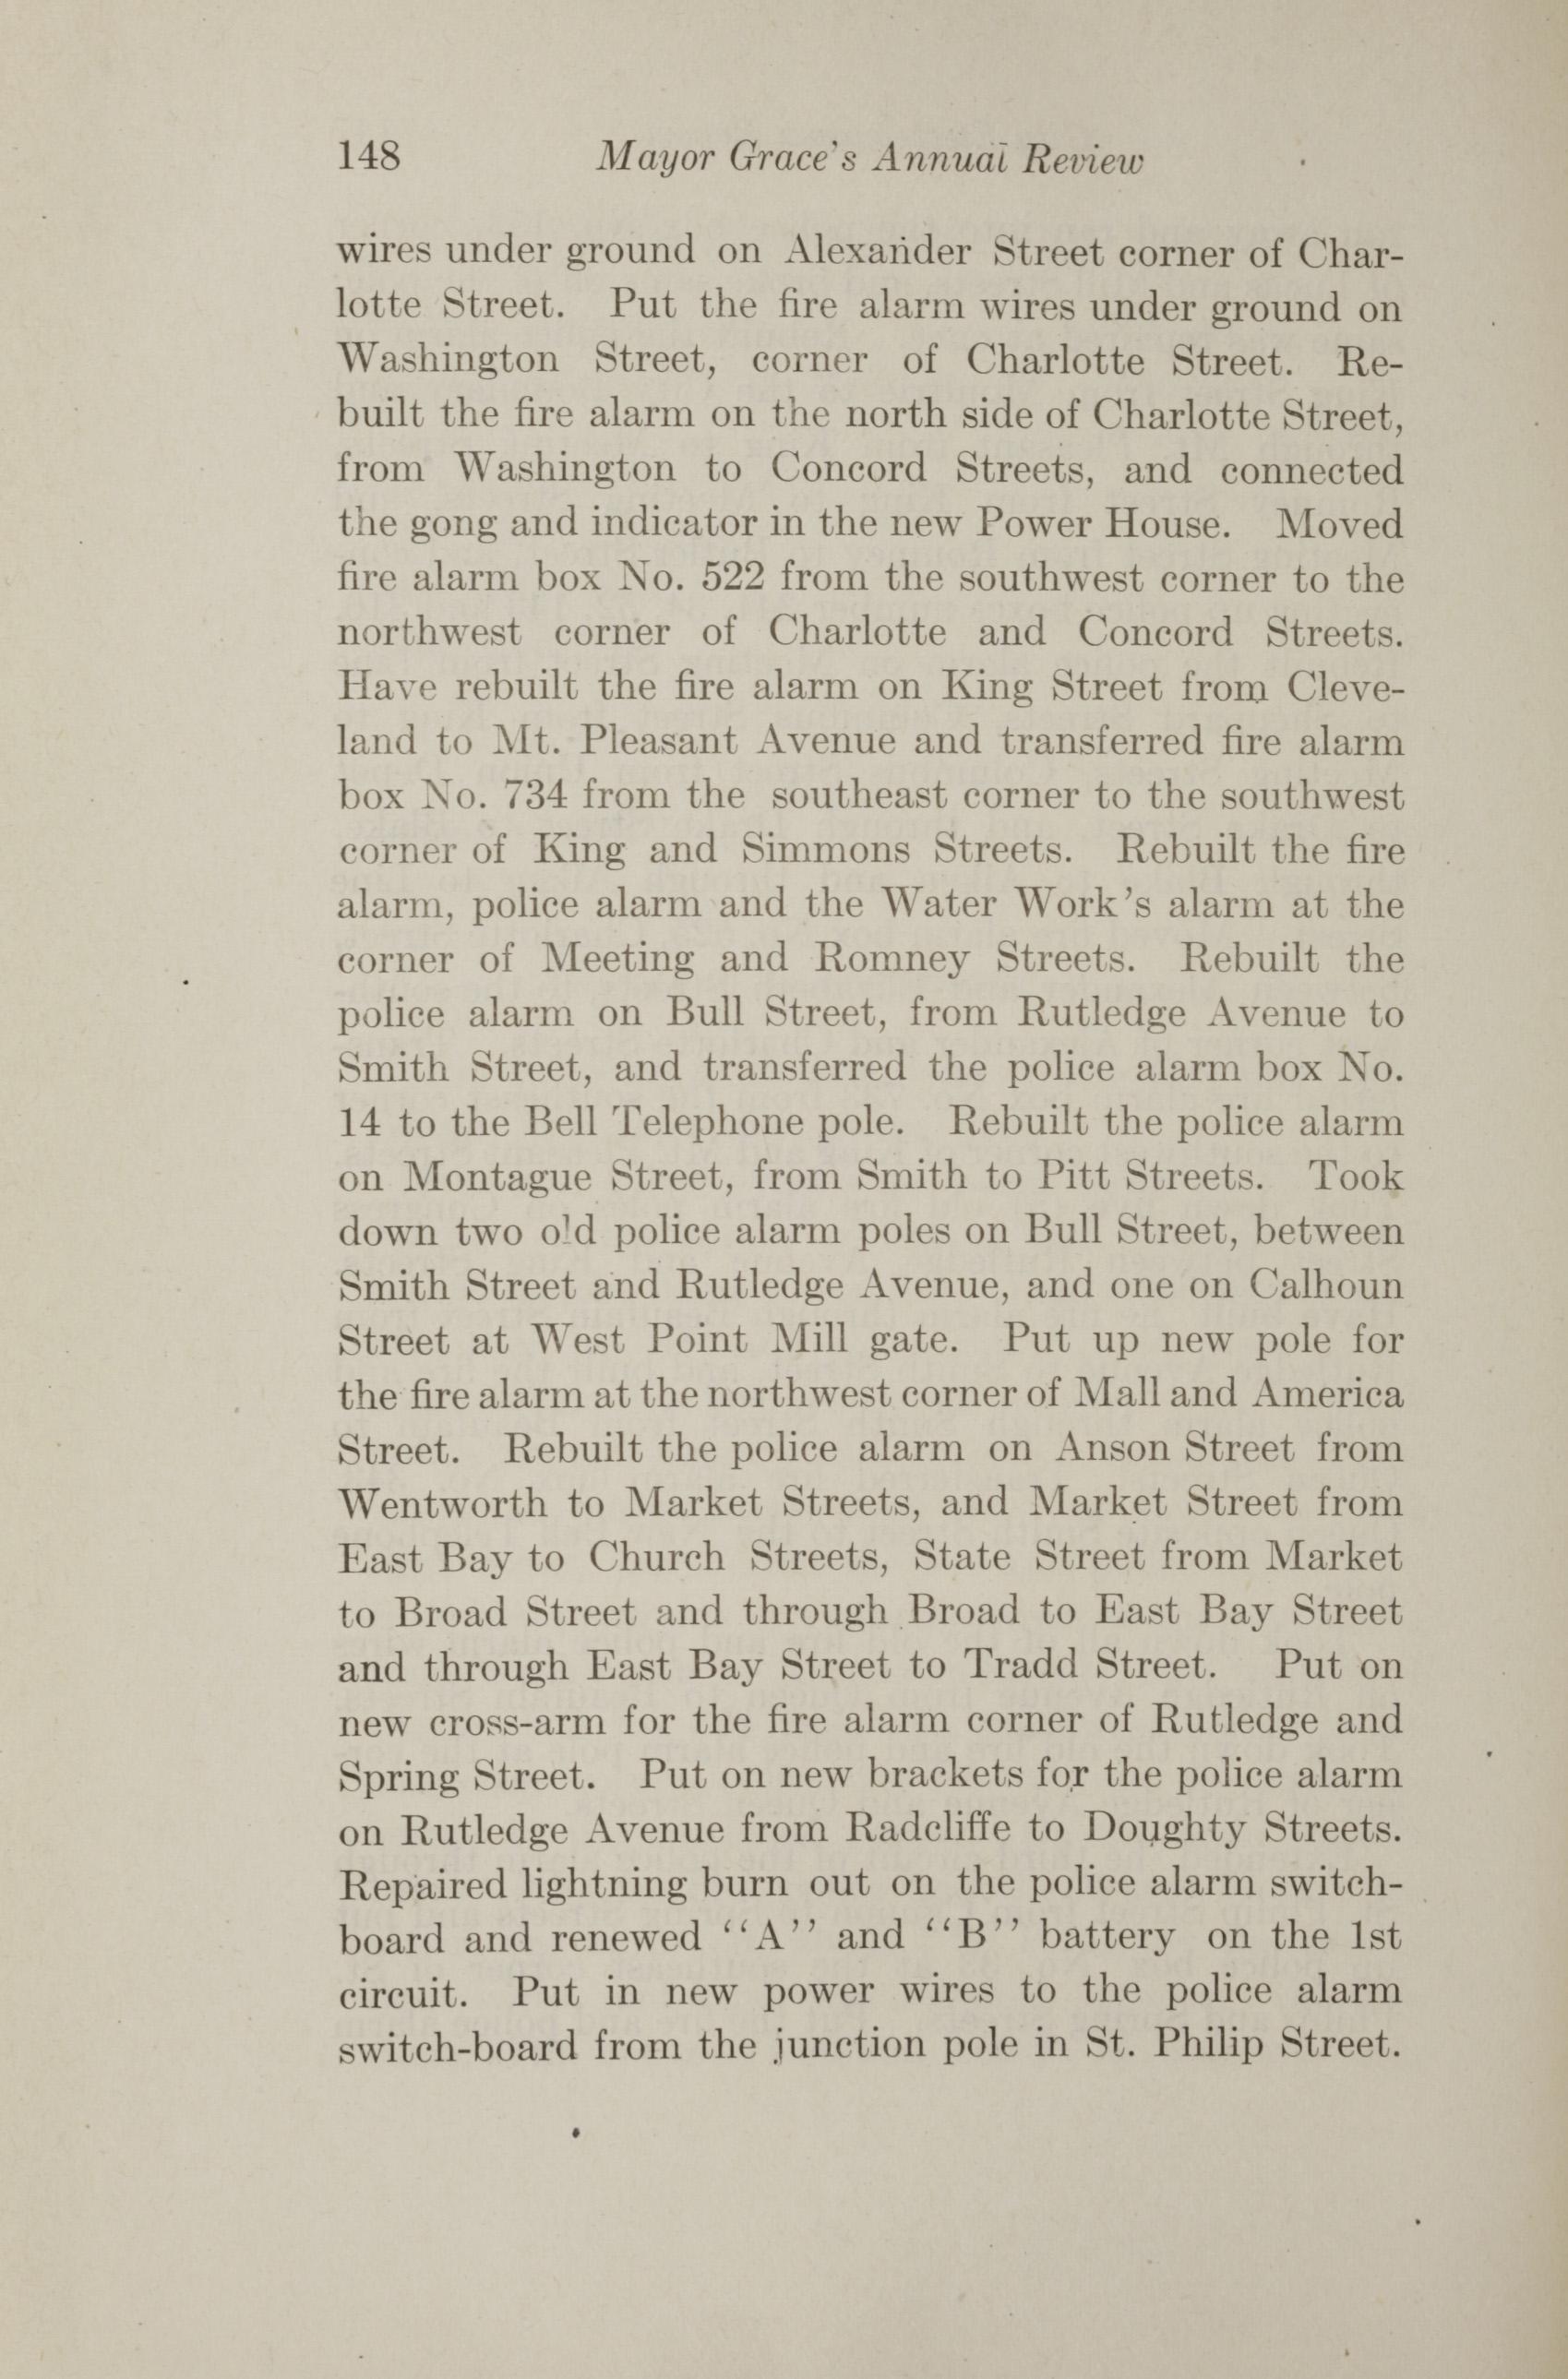 Charleston Yearbook, 1912, page 148